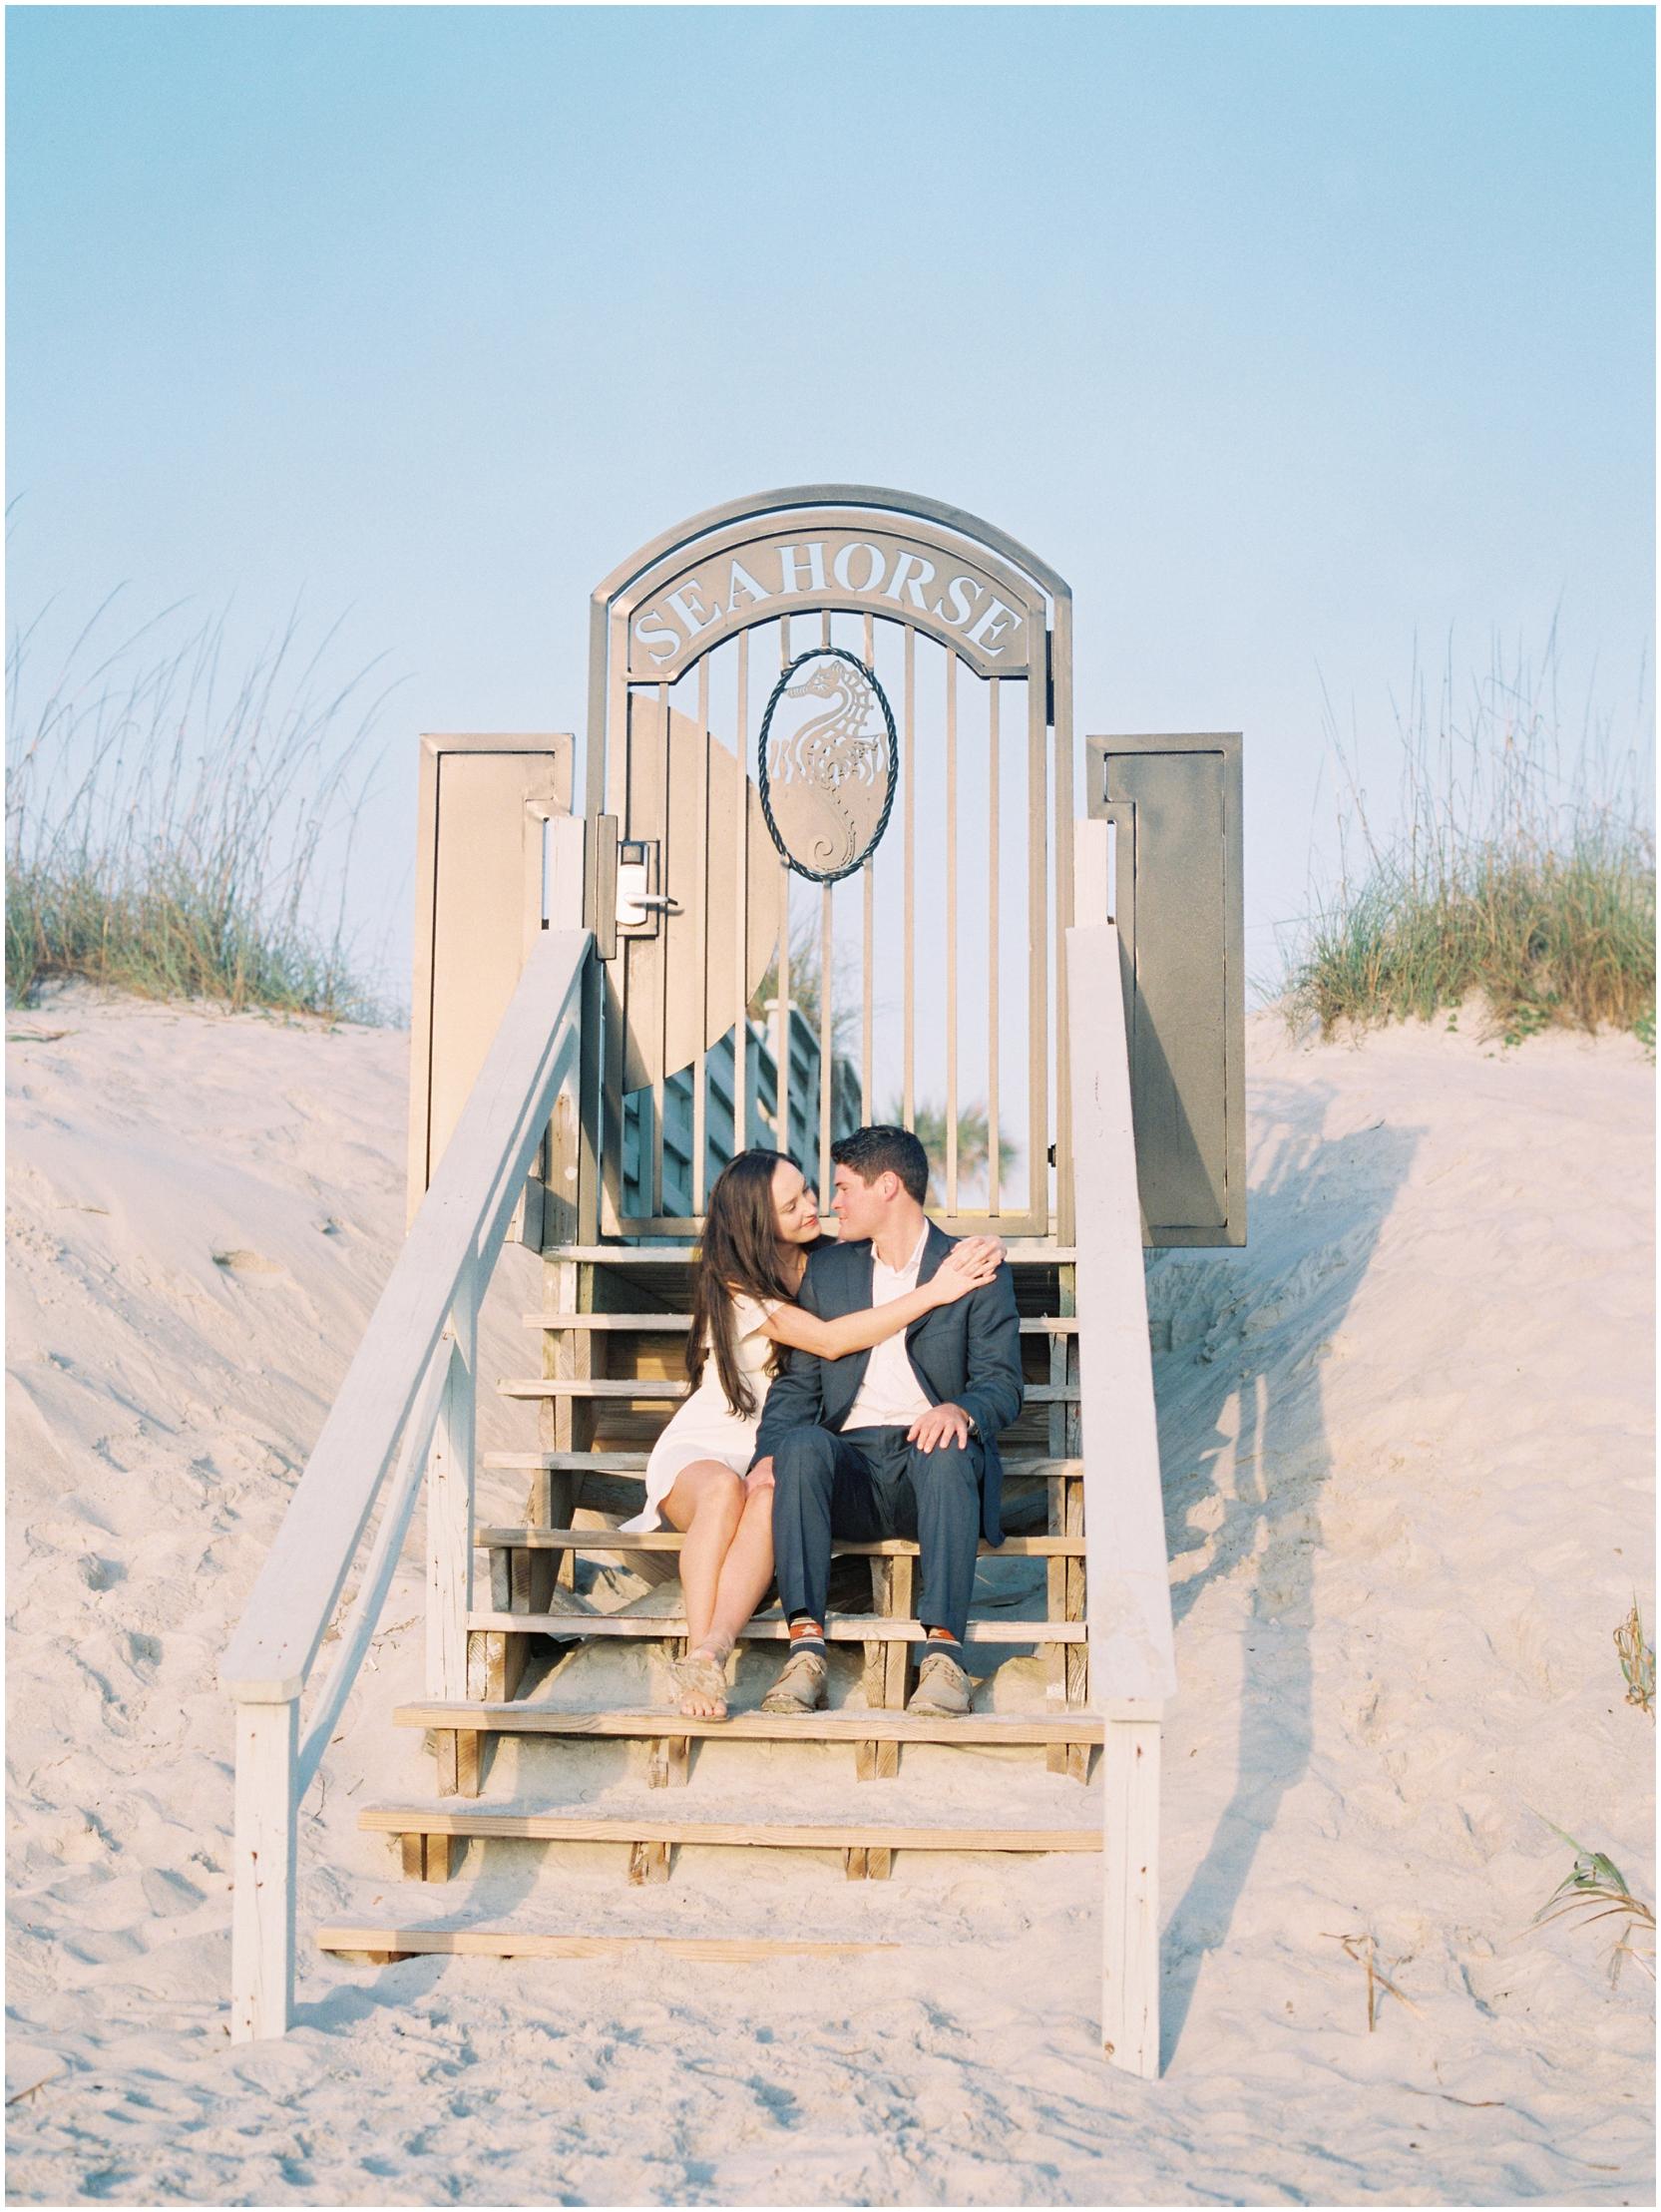 Lisa Silva Photography -Engagement Session at Neptune Beach, Florida- Jacksonville and North East Florida Fine Art Film Photographer_0016.jpg